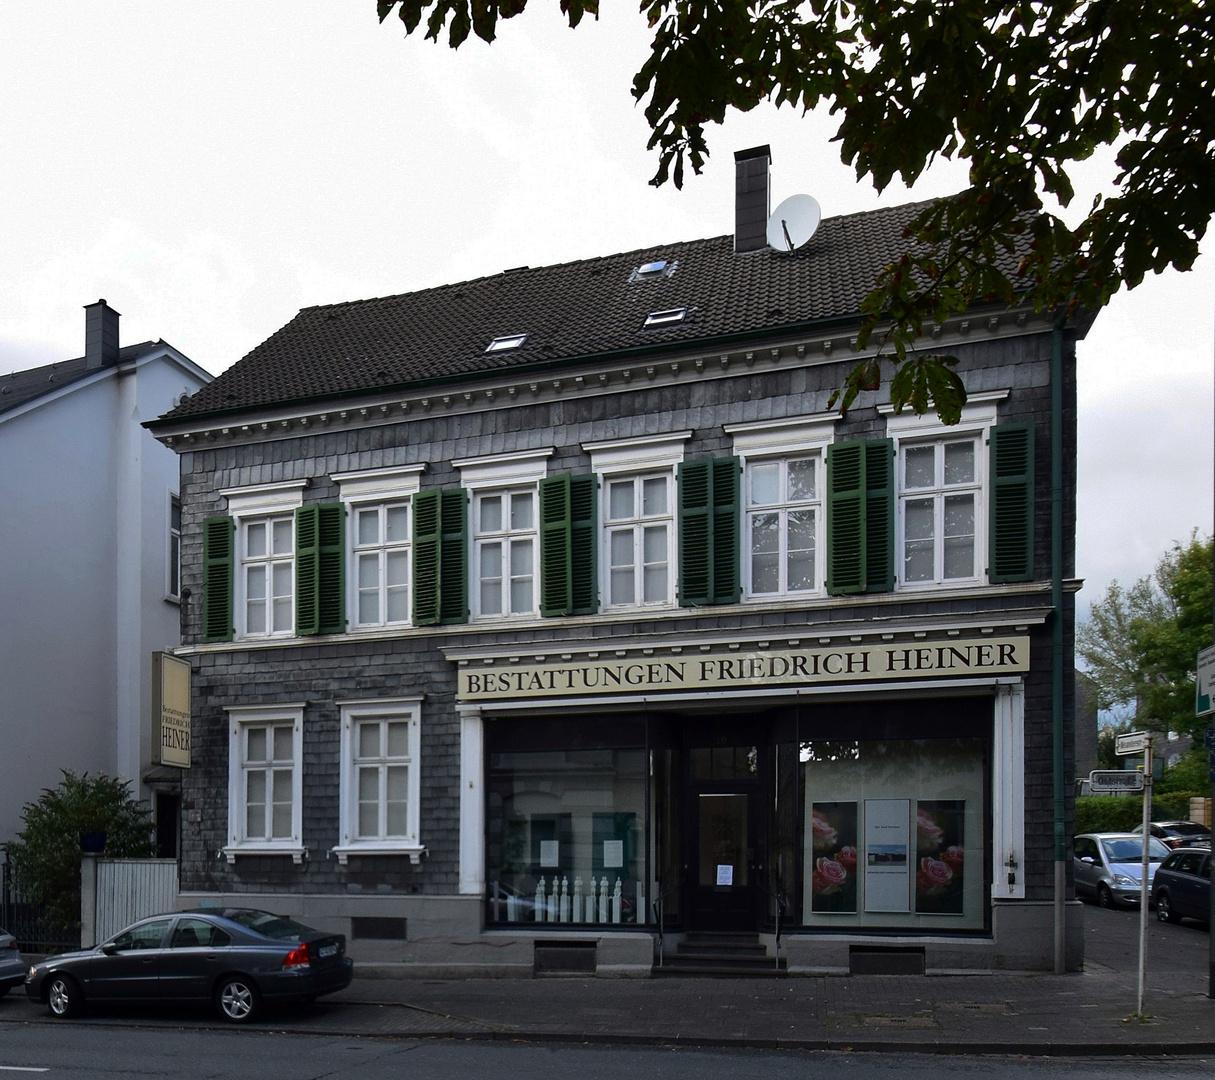 Schieferhaus in Wichlinghausen (3)